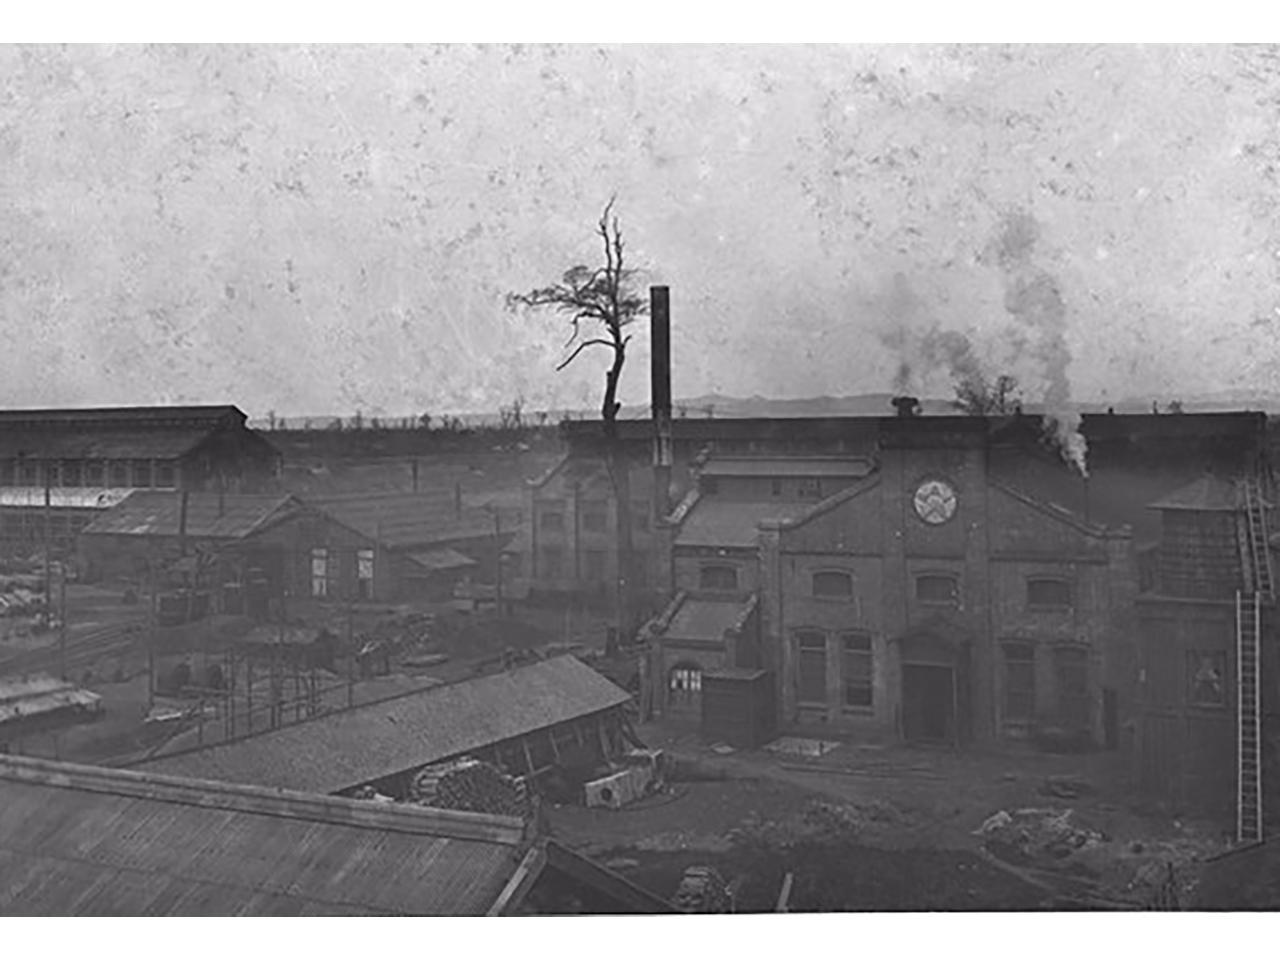 画像:旧北海道炭礦鉄道岩見沢工場(岩見沢レールセンター)(4)